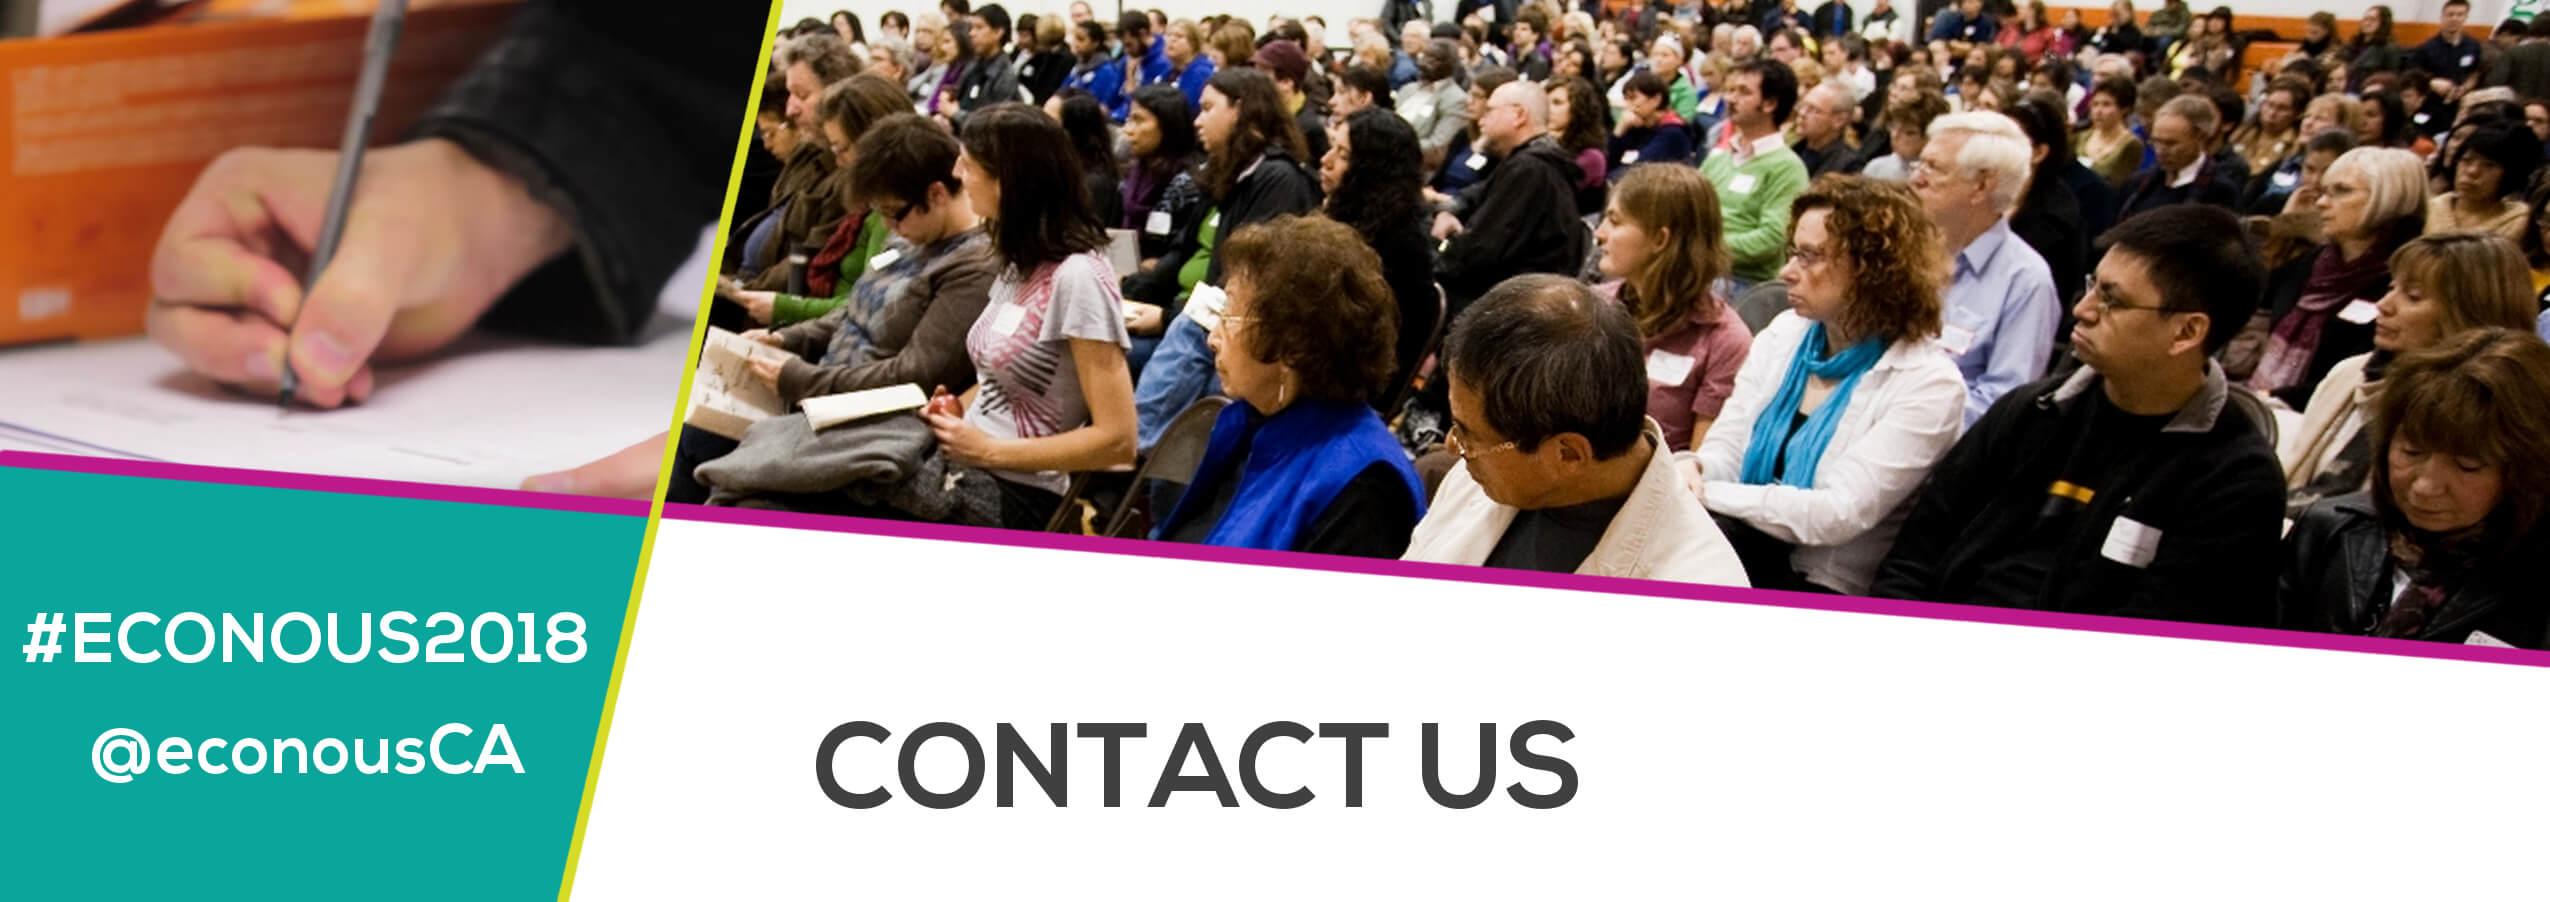 EconoUs2017: Contact us